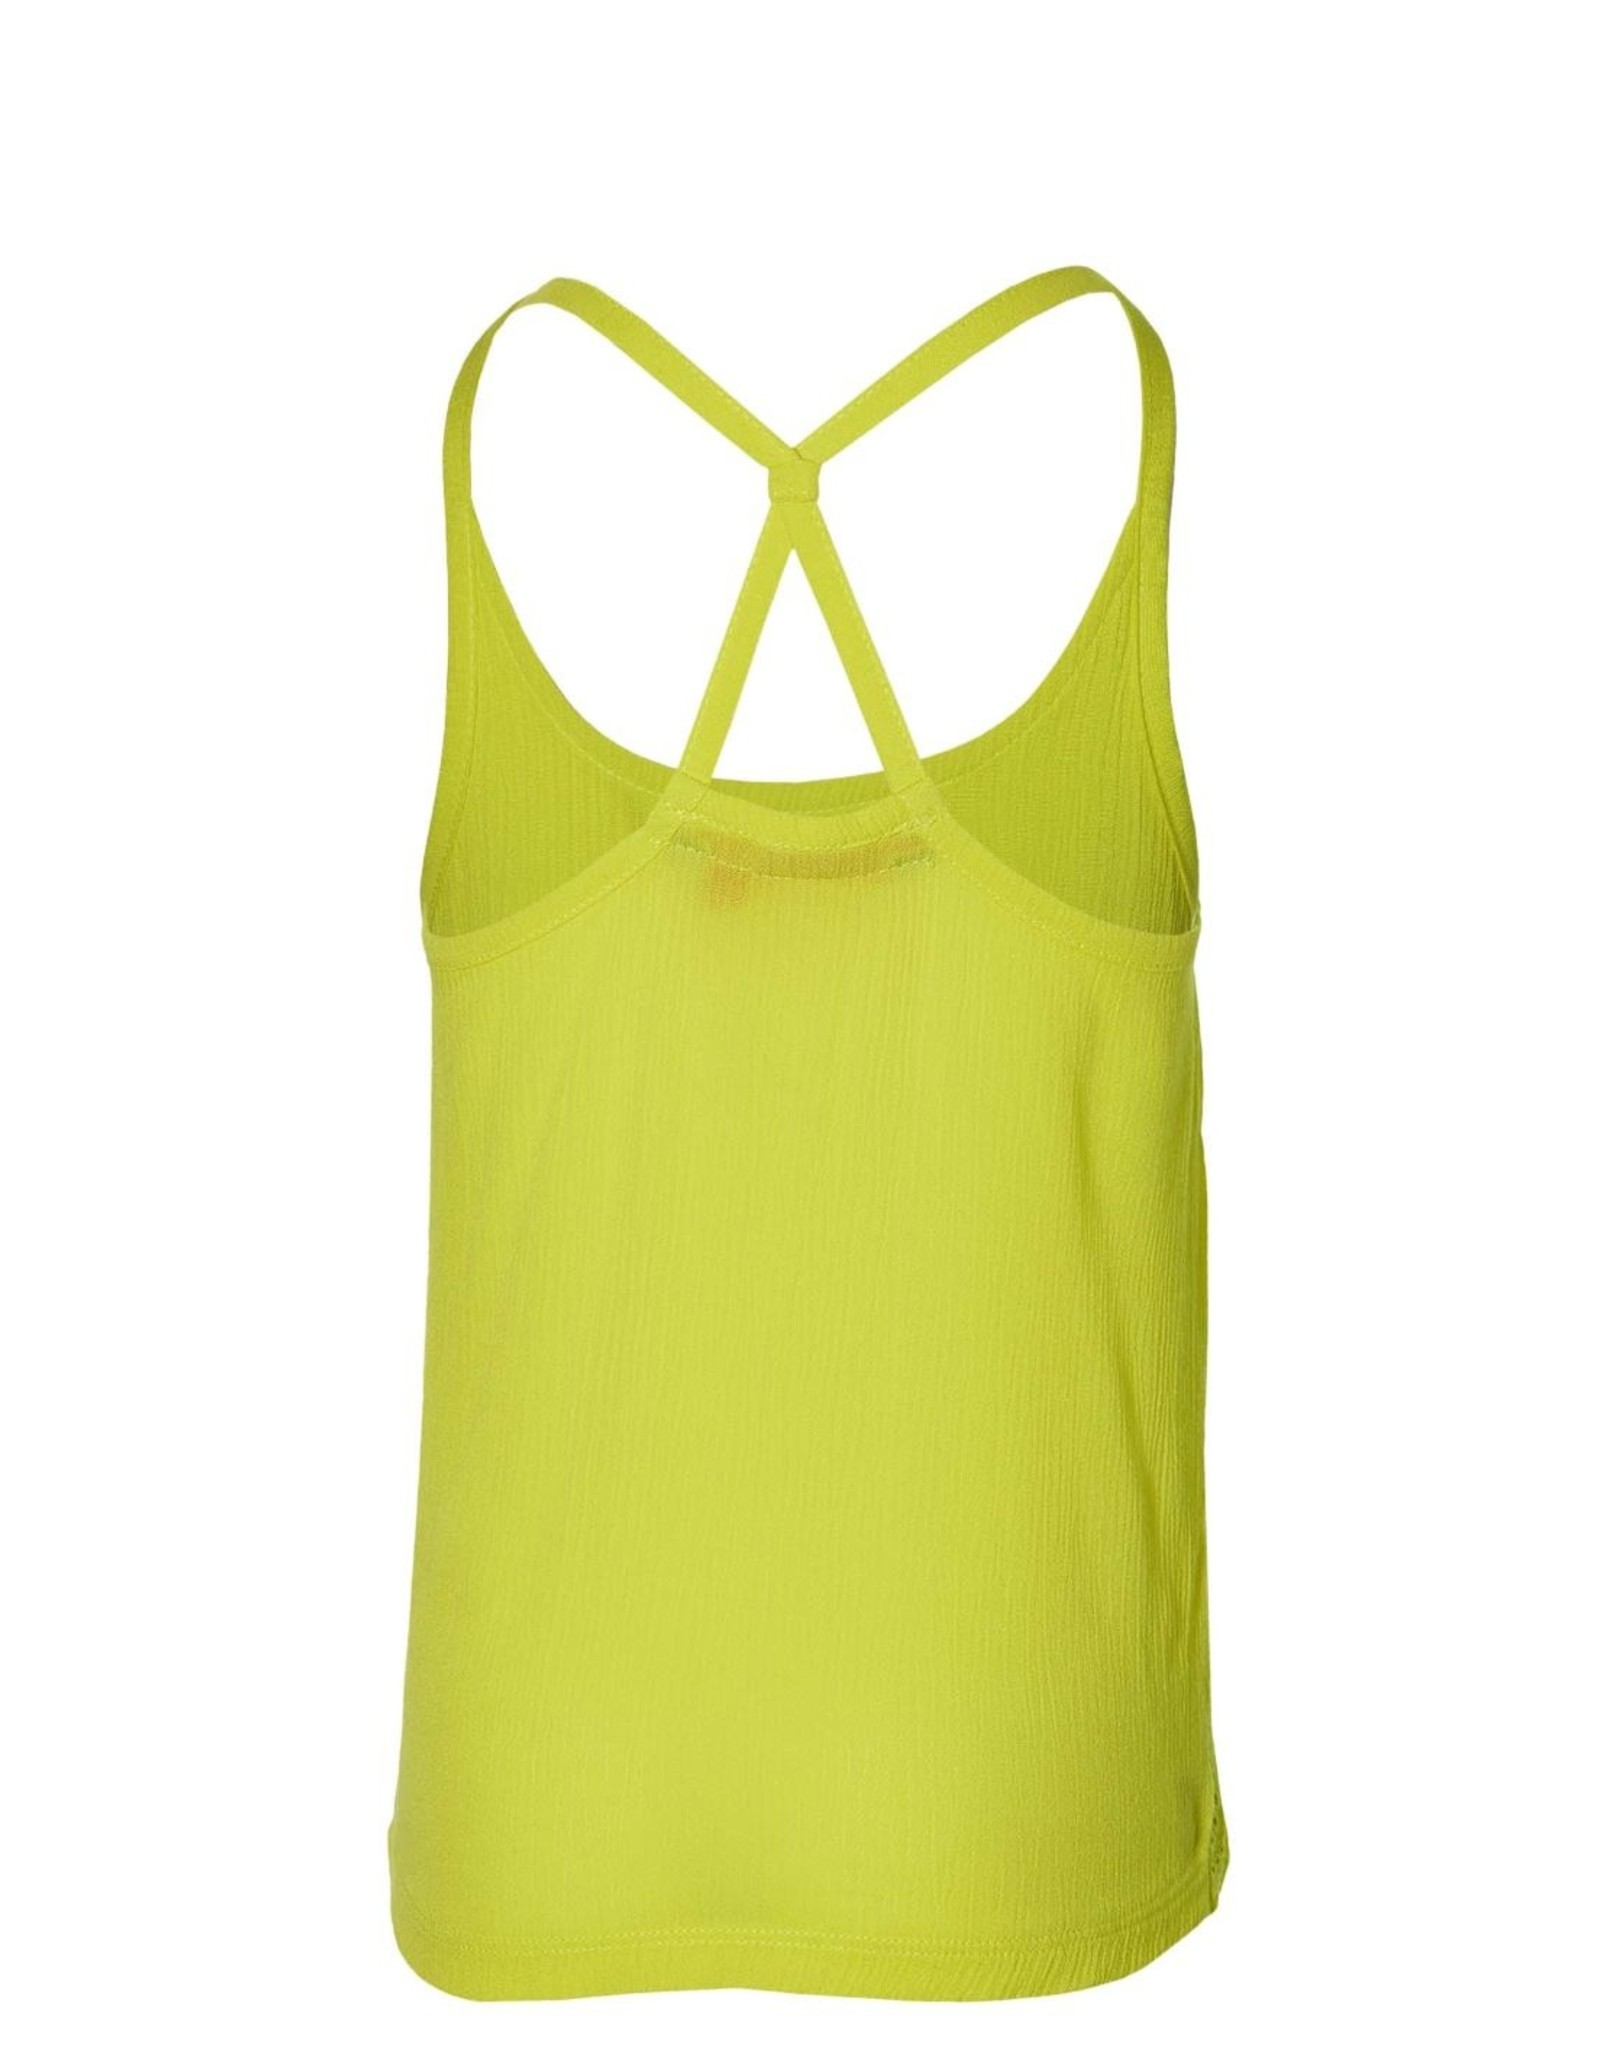 Quapi Quapi top Felina lemon yellow